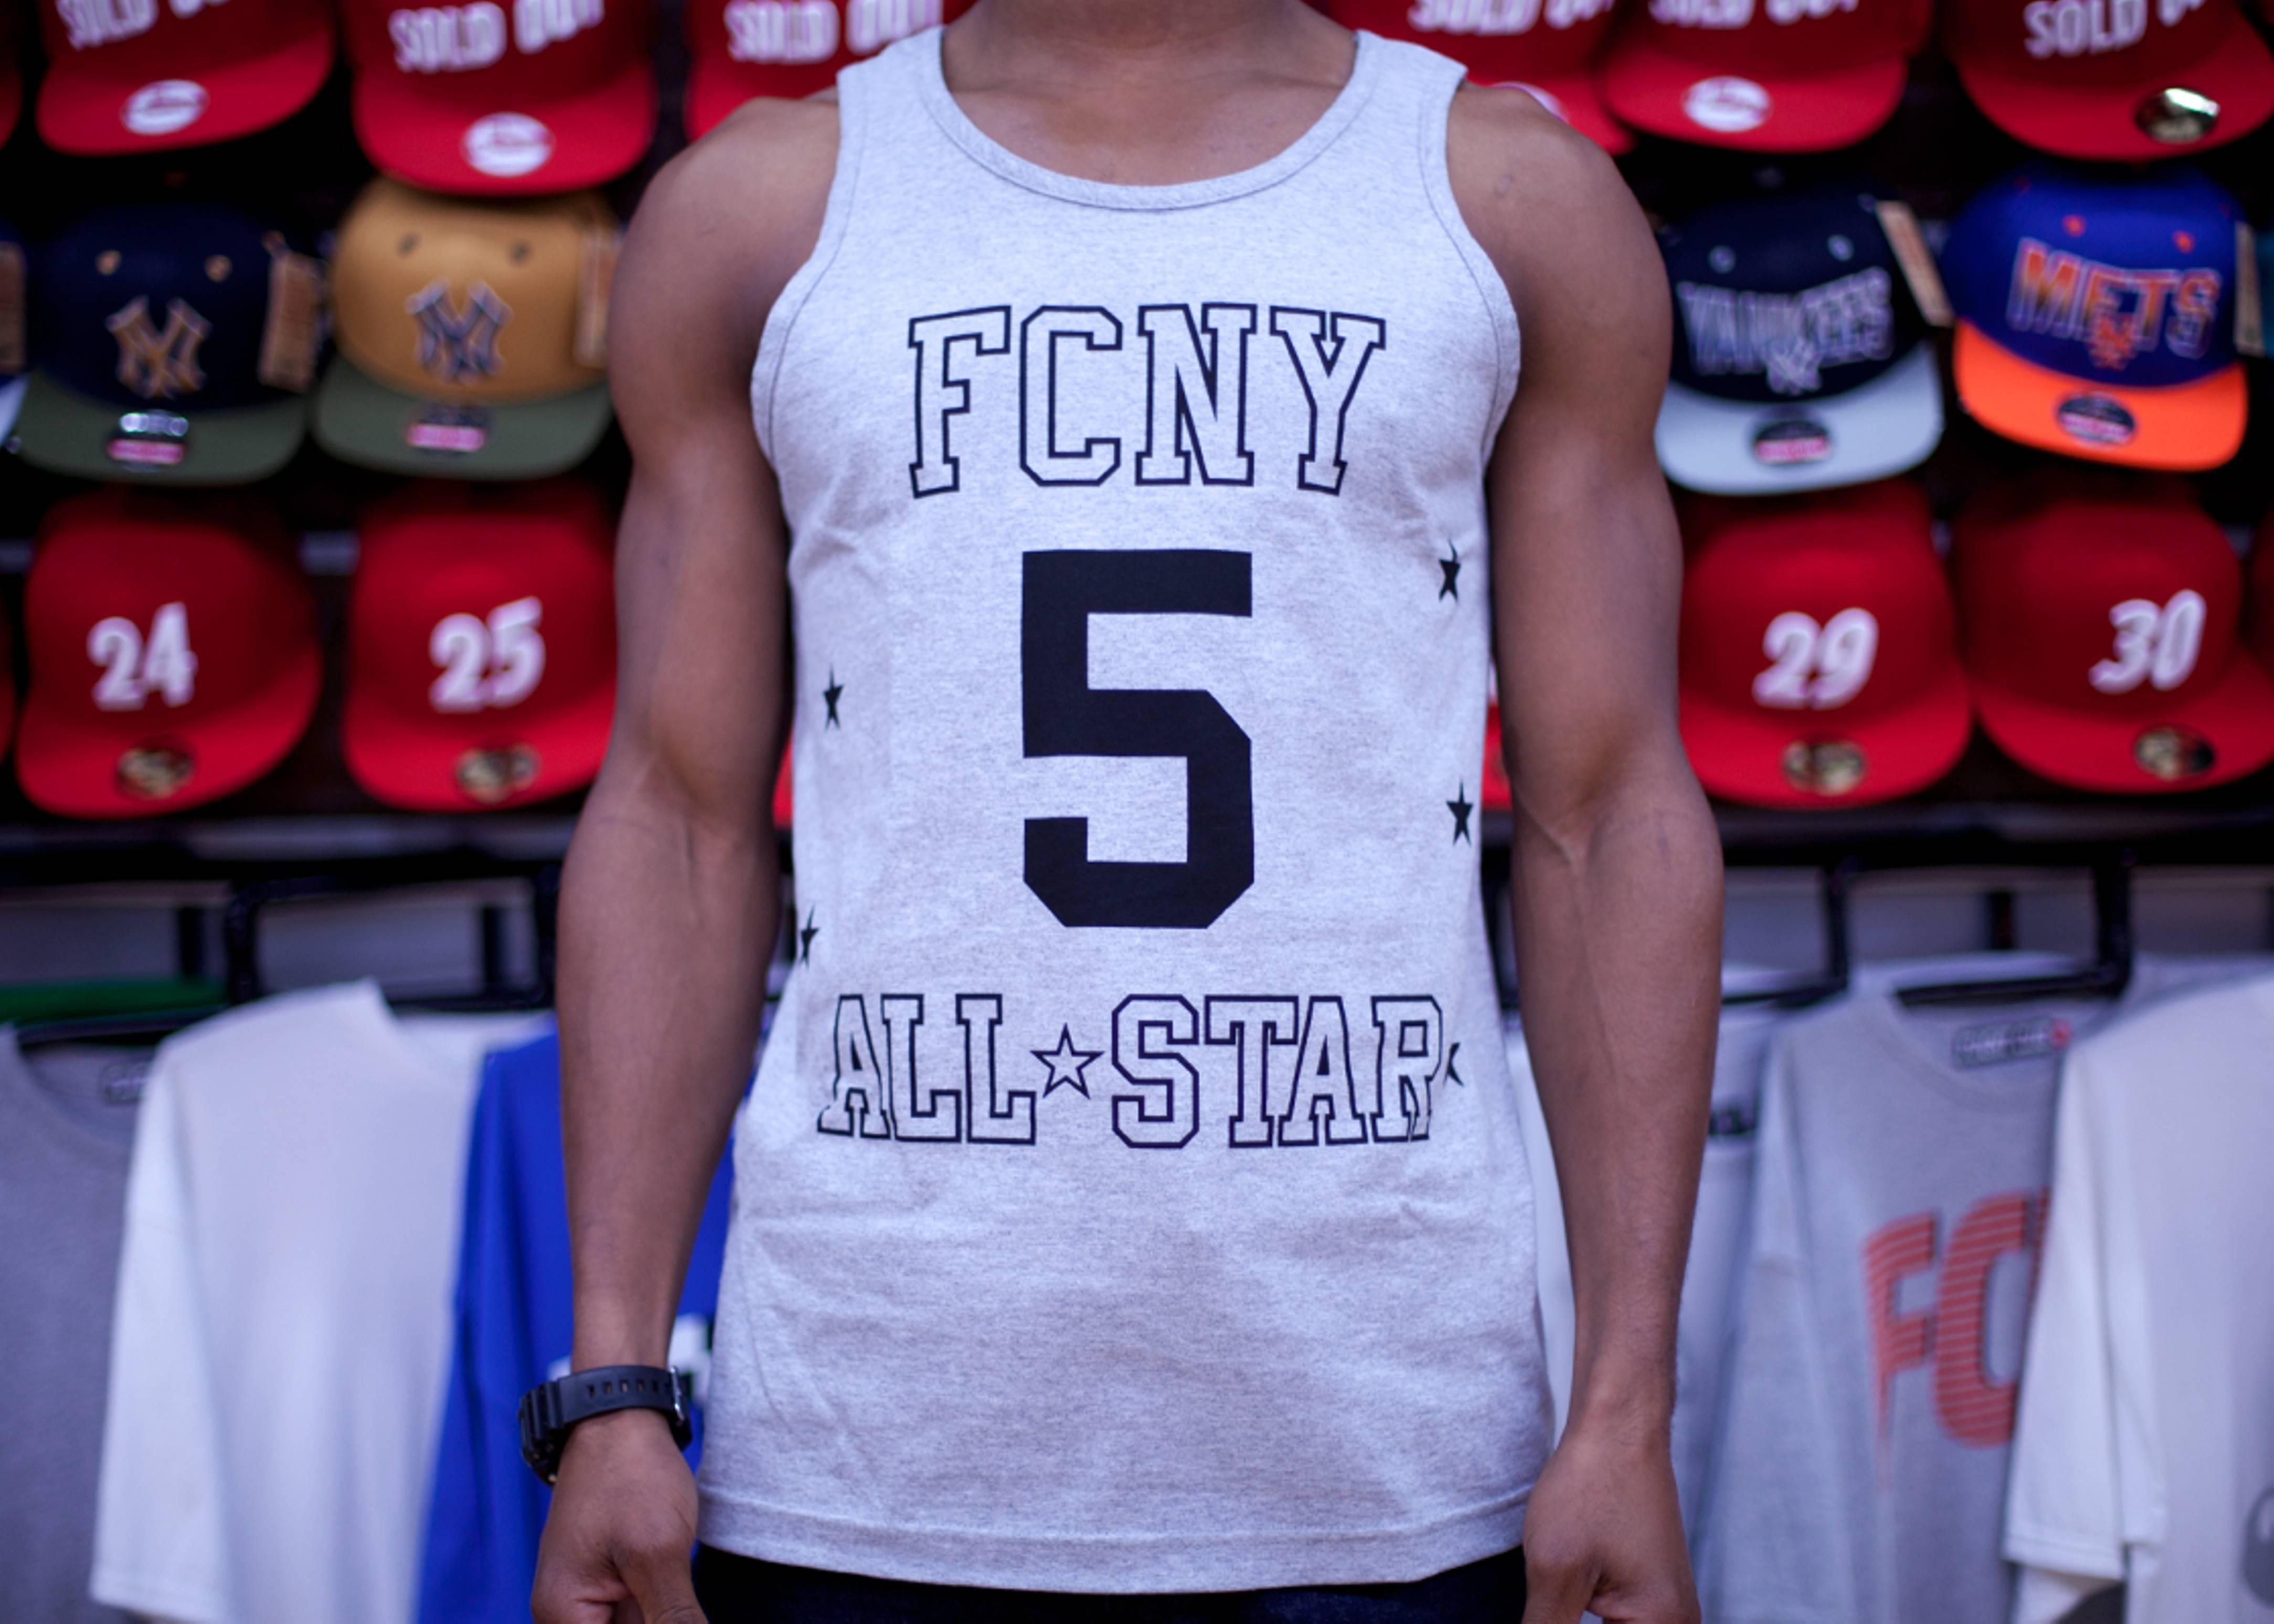 fcny all-star tank